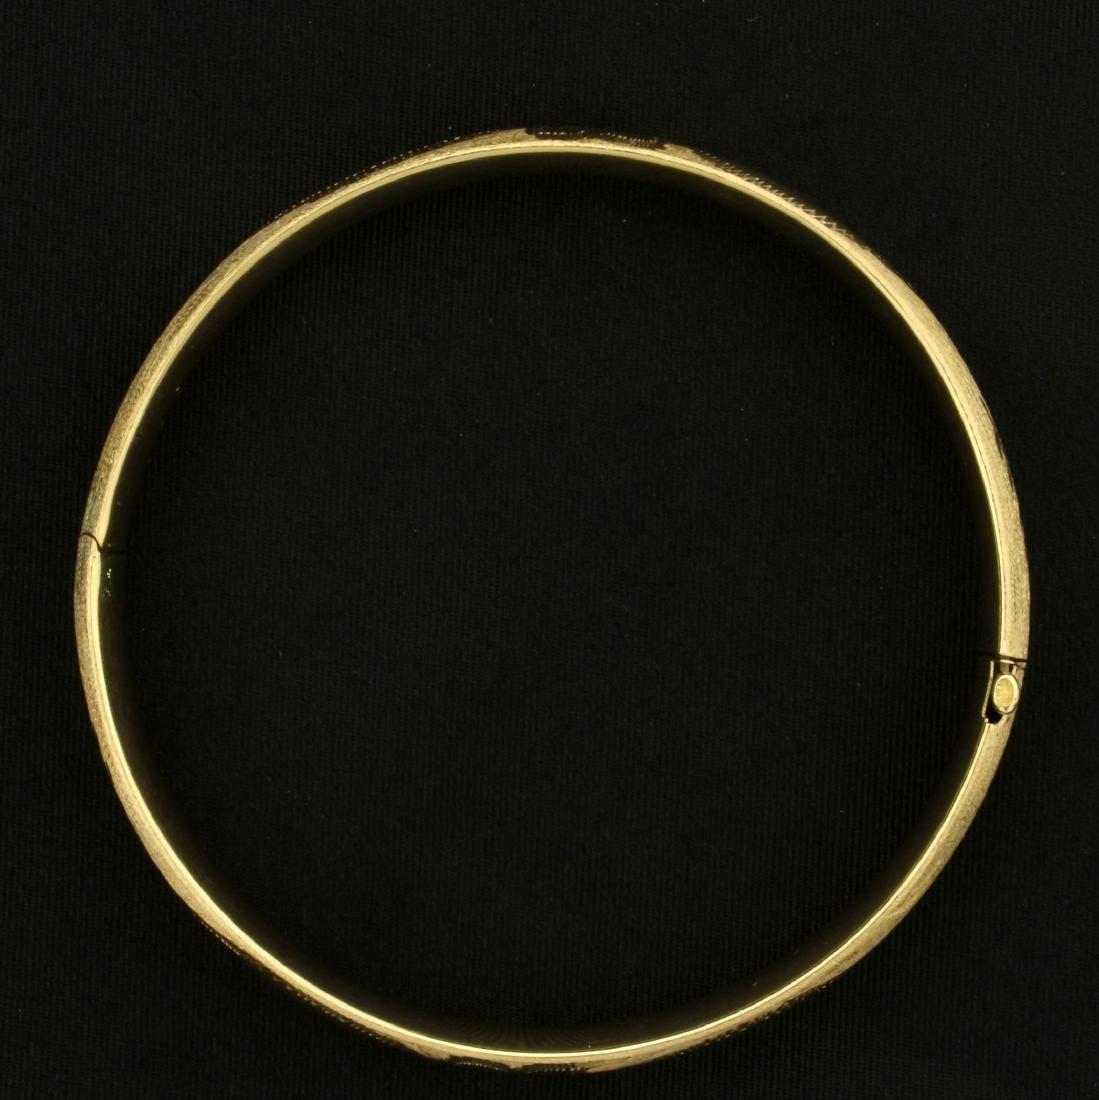 Diamond Cut Floral Design Bangle Bracelet in 14K Yellow - 3